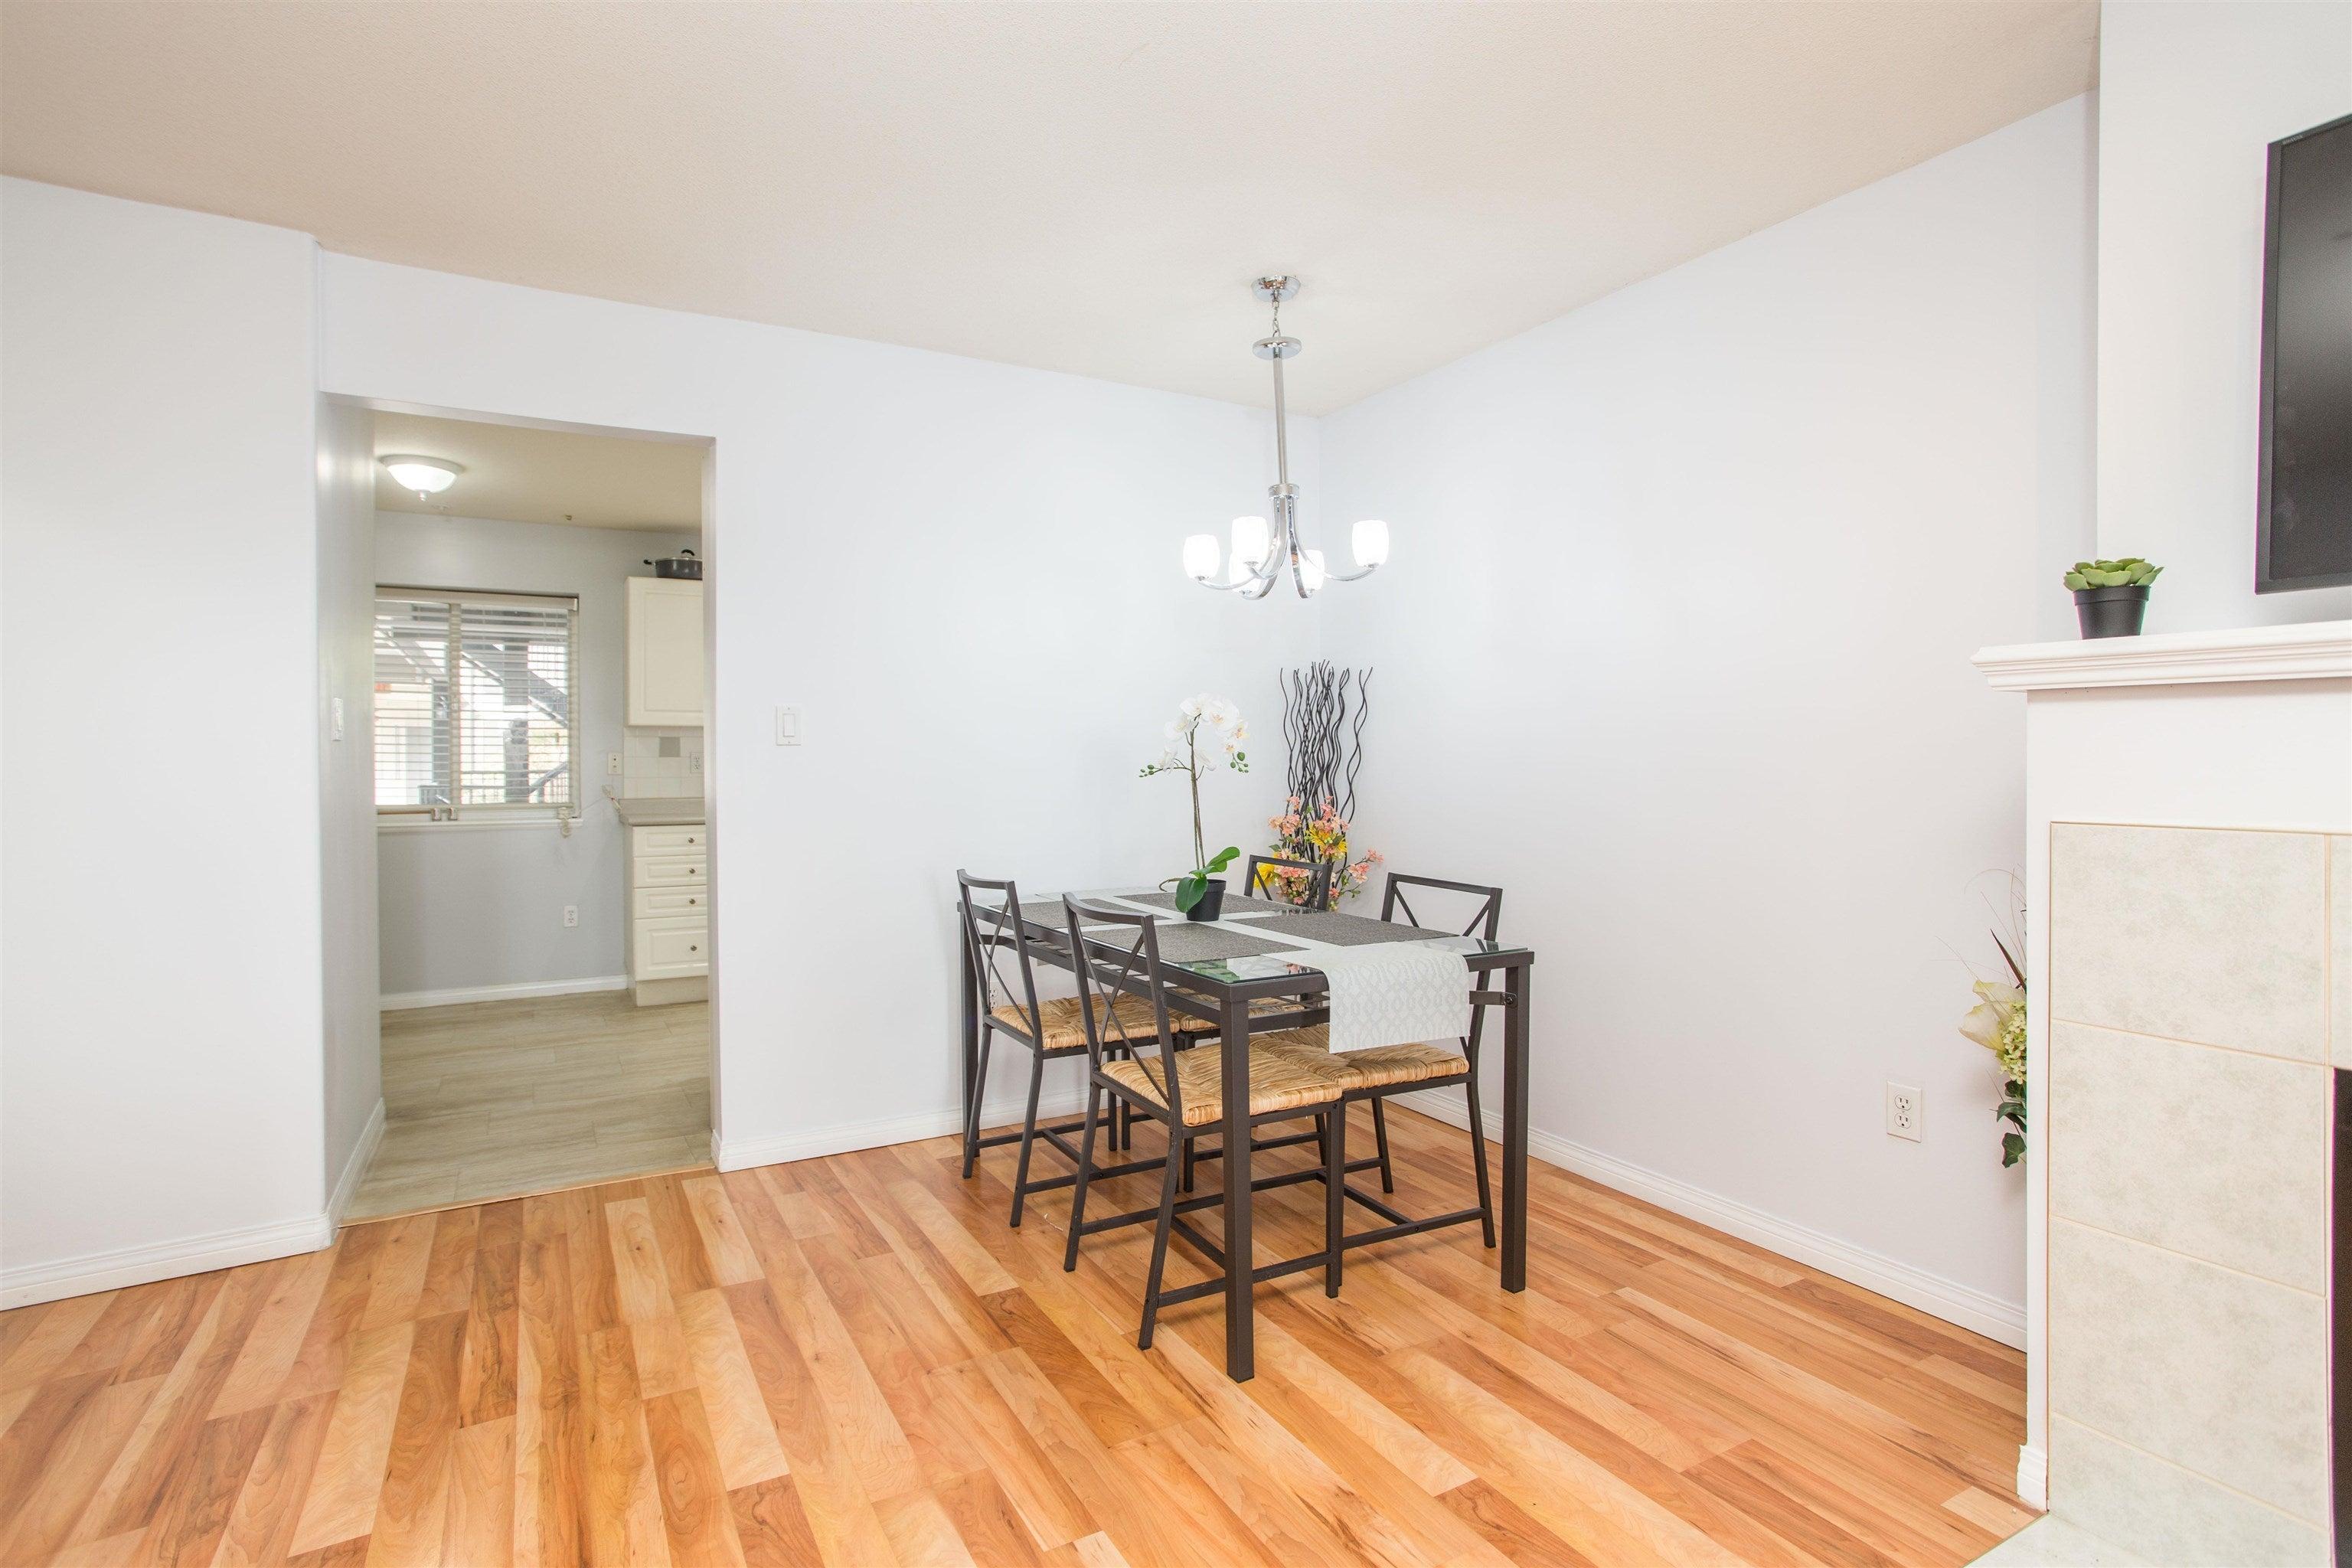 7 205 LEBLEU STREET - Maillardville Apartment/Condo for sale, 3 Bedrooms (R2625671) - #6